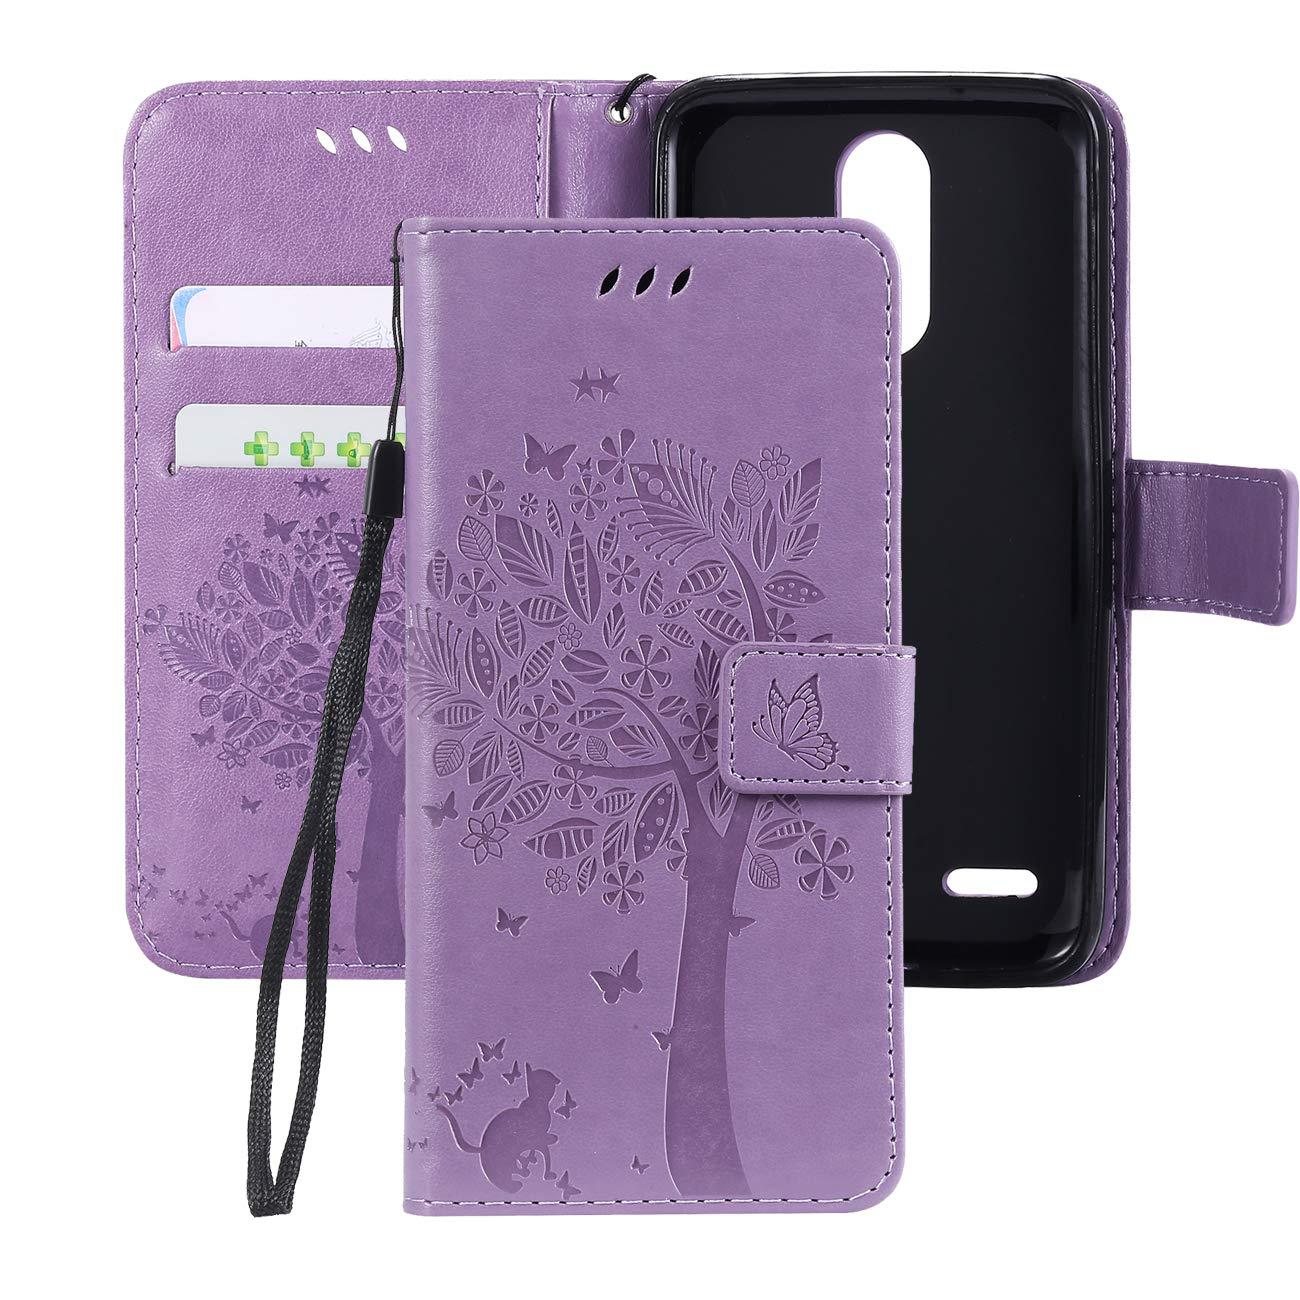 LG K30 Case,LG Phoenix Plus Case,LG Premier Pro LTE Case,LG K10 Alpha,LG K10 2018 Flip Case,PU Leather Wallet Embossed Floral Tree Cat Case with Kickstand Flip Cover Card Holder Light Purple